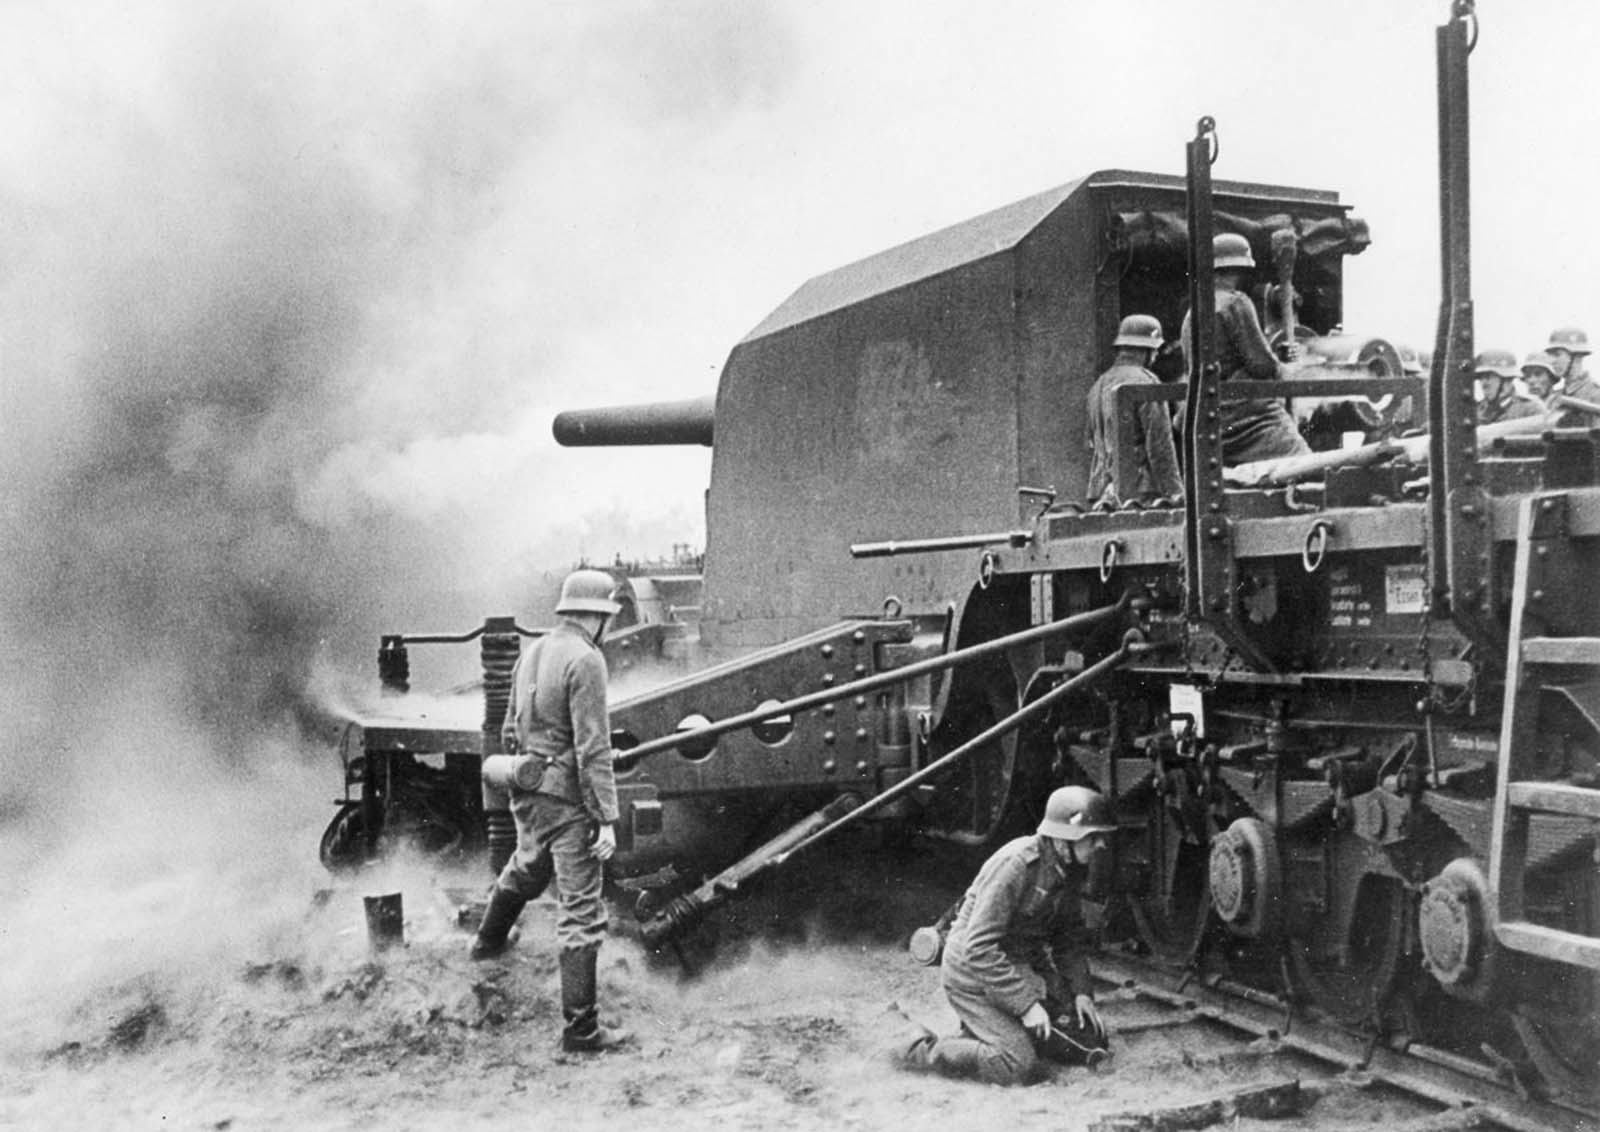 A German railway gun in action in France. 1940.